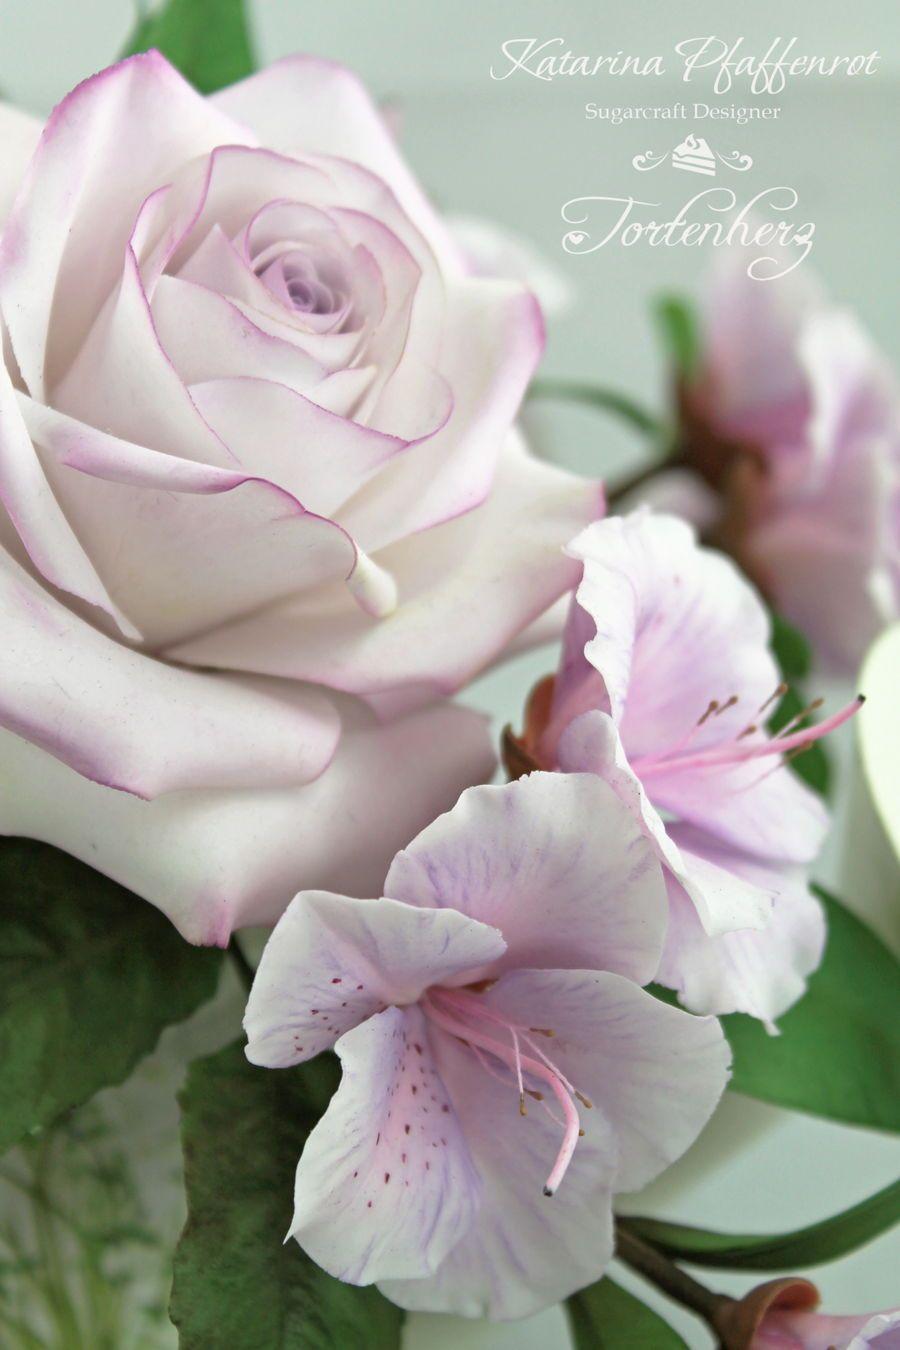 A Small Sugar Flower Bouquet In Light Lilac Tones Edible Sugar